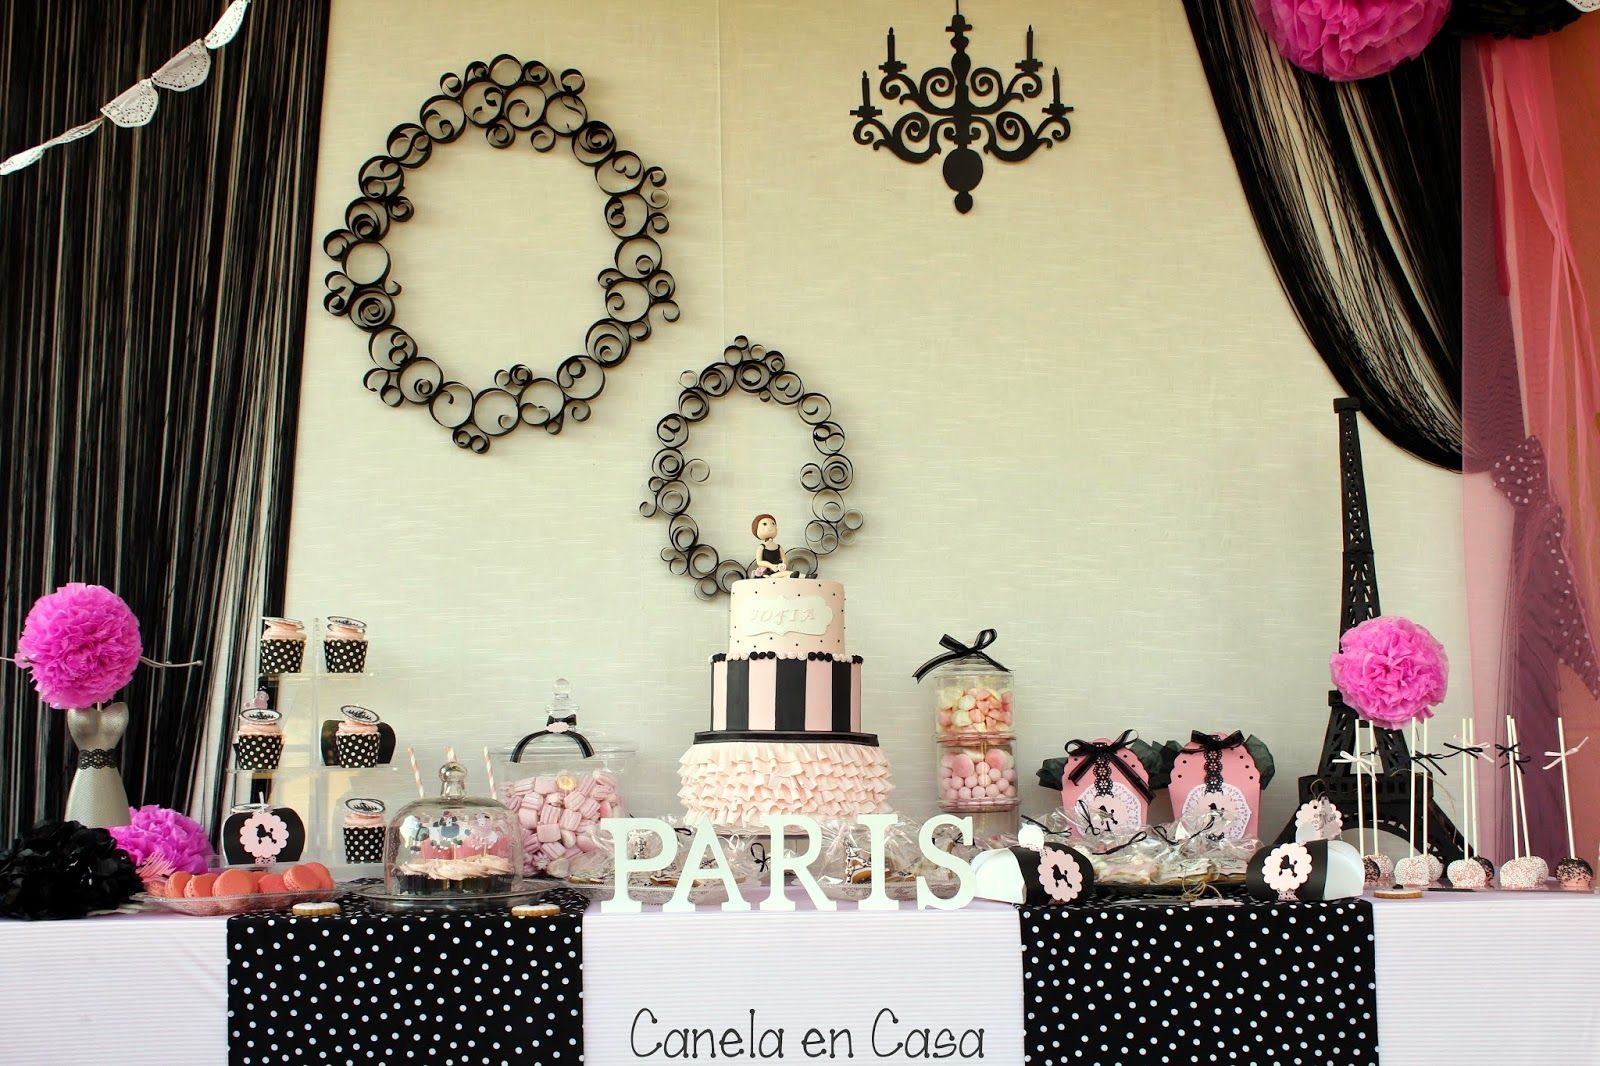 9a3ba1542 Centros de mesa elegantes torre eiffel buscar con google Fiestas elegantes  decoracion